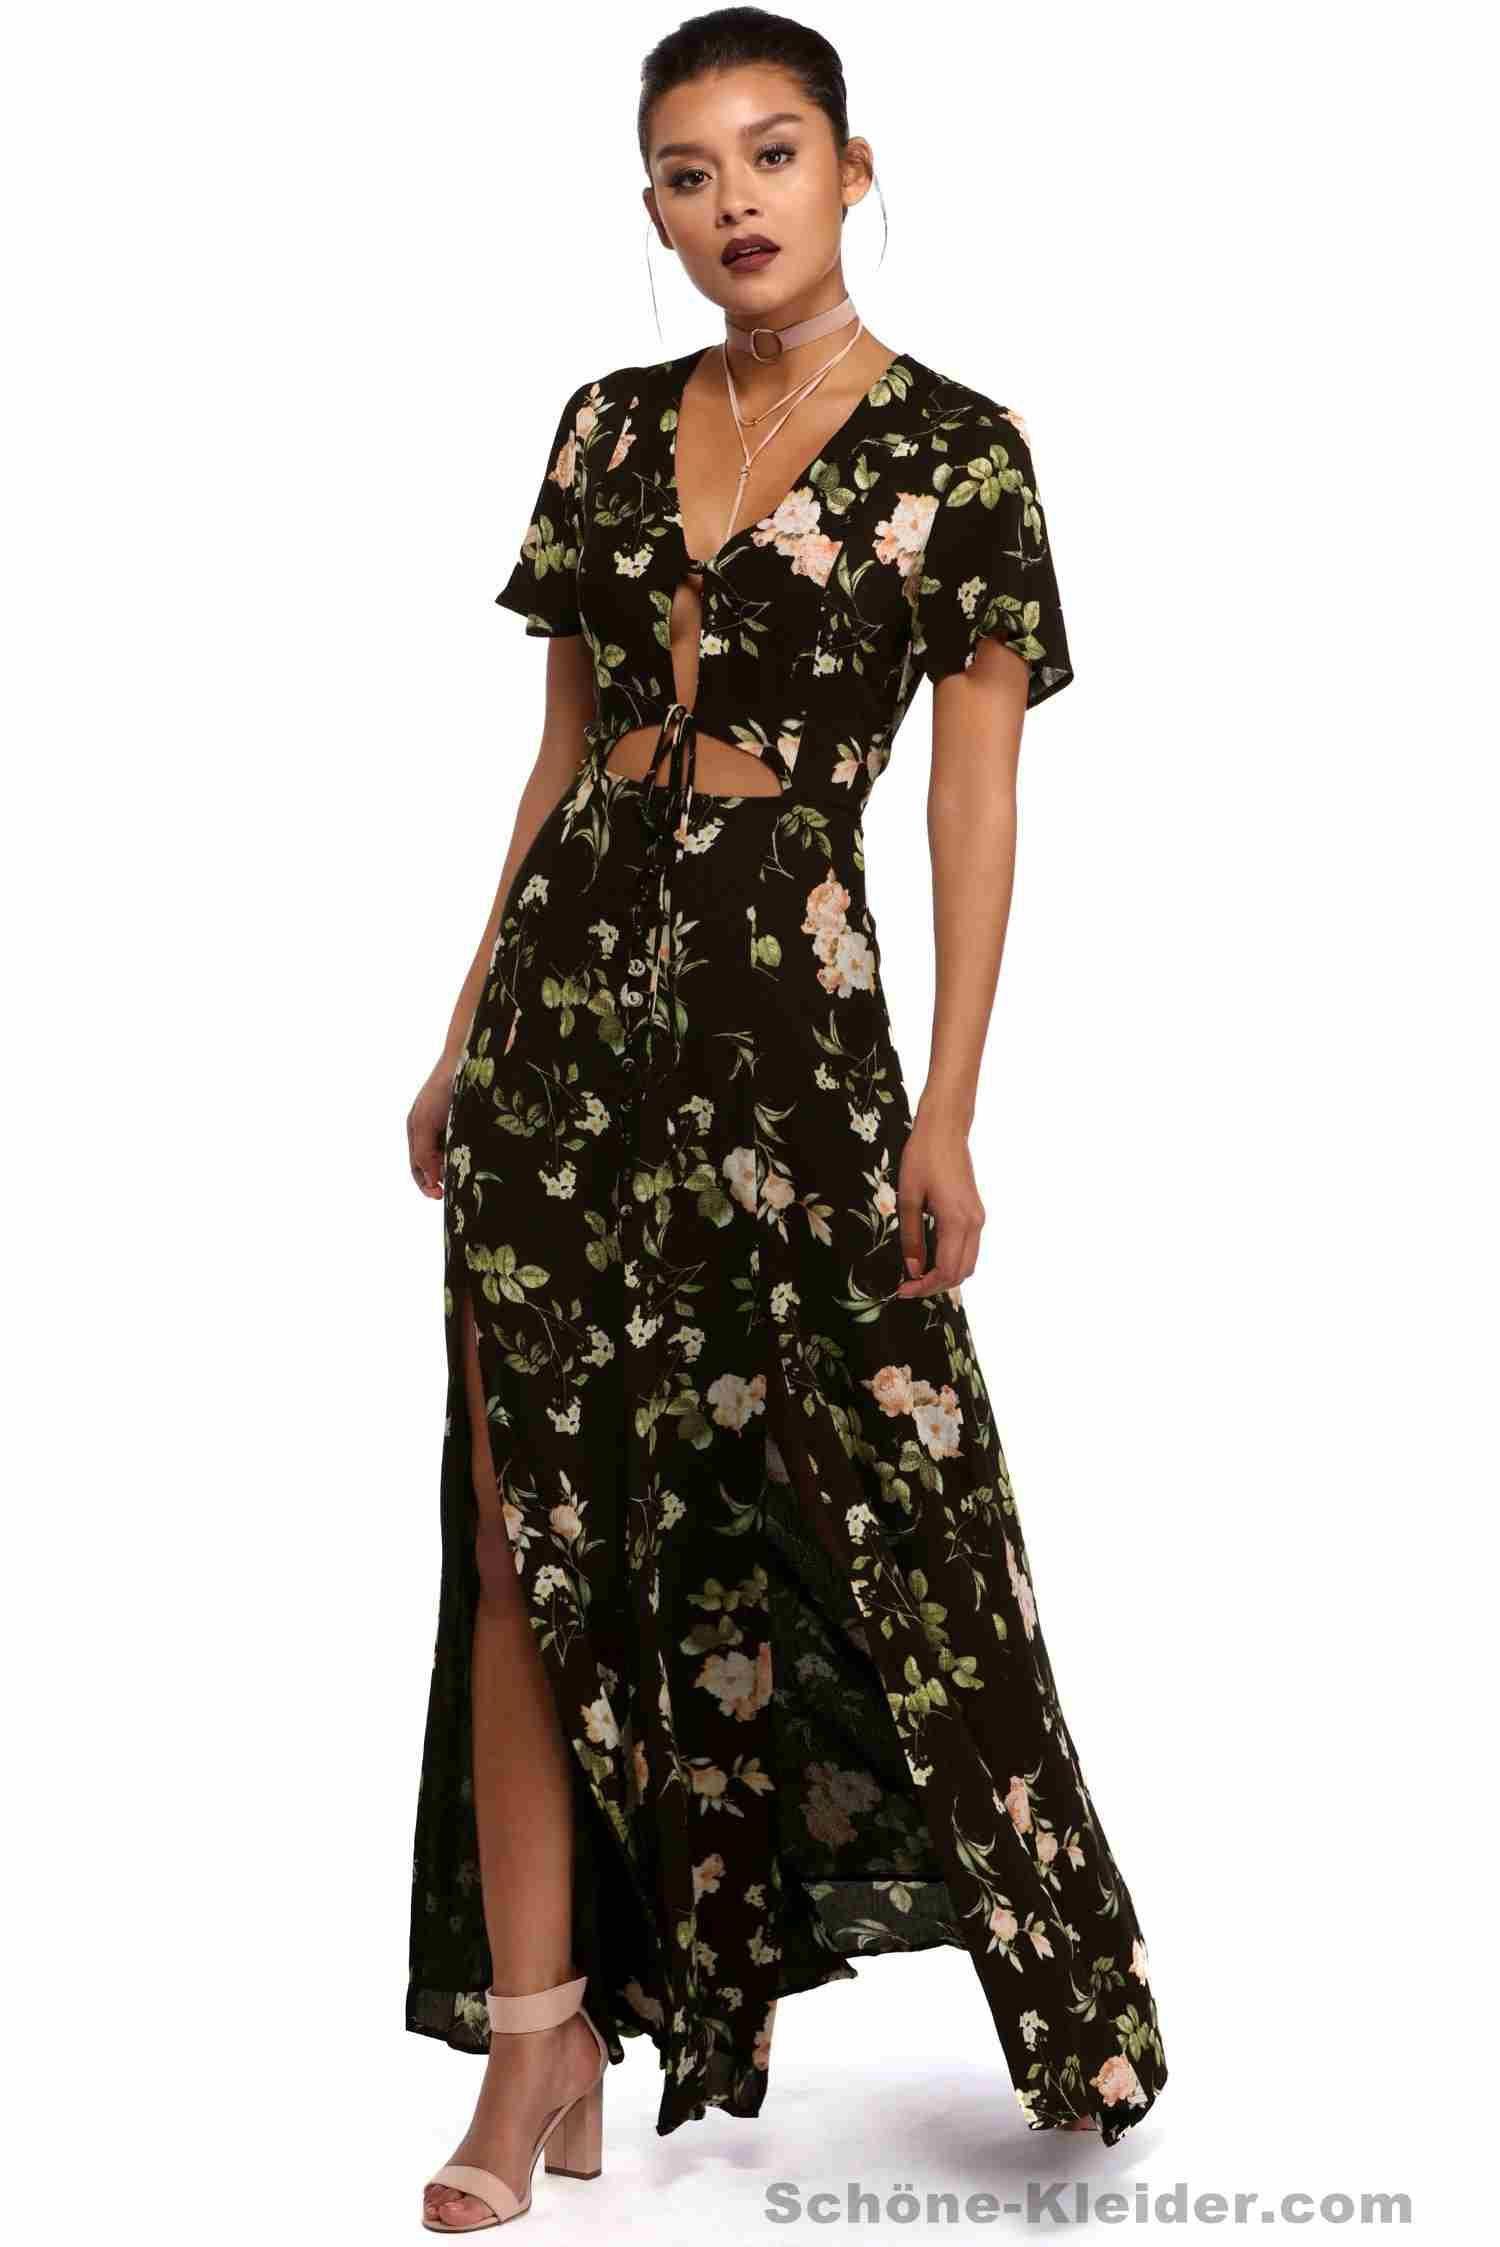 Designer Top Elegante Sommerkleider DesignFormal Leicht Elegante Sommerkleider Stylish